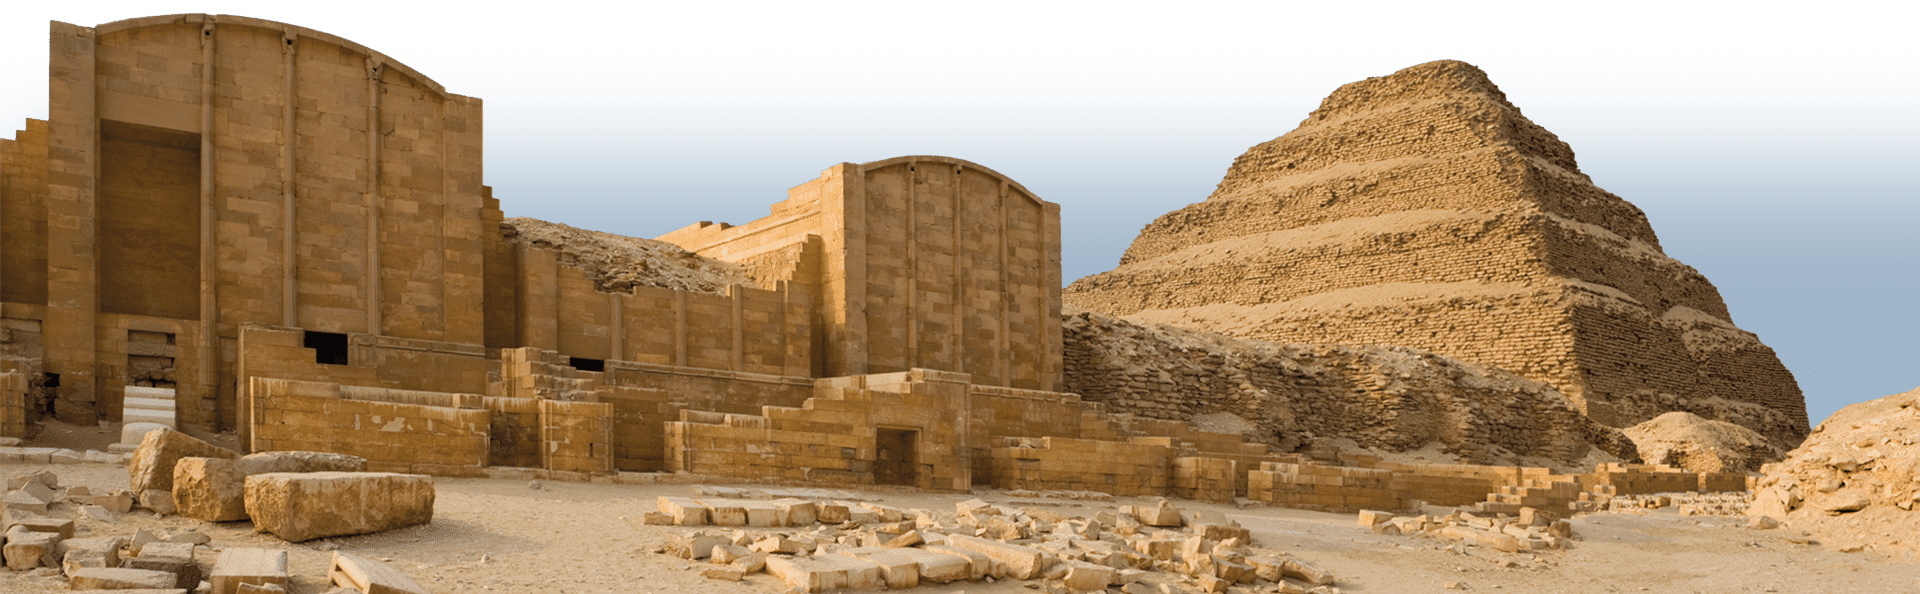 Sakkara, Egypt, Pyramid Explorer, Ancient World Tours SELLING